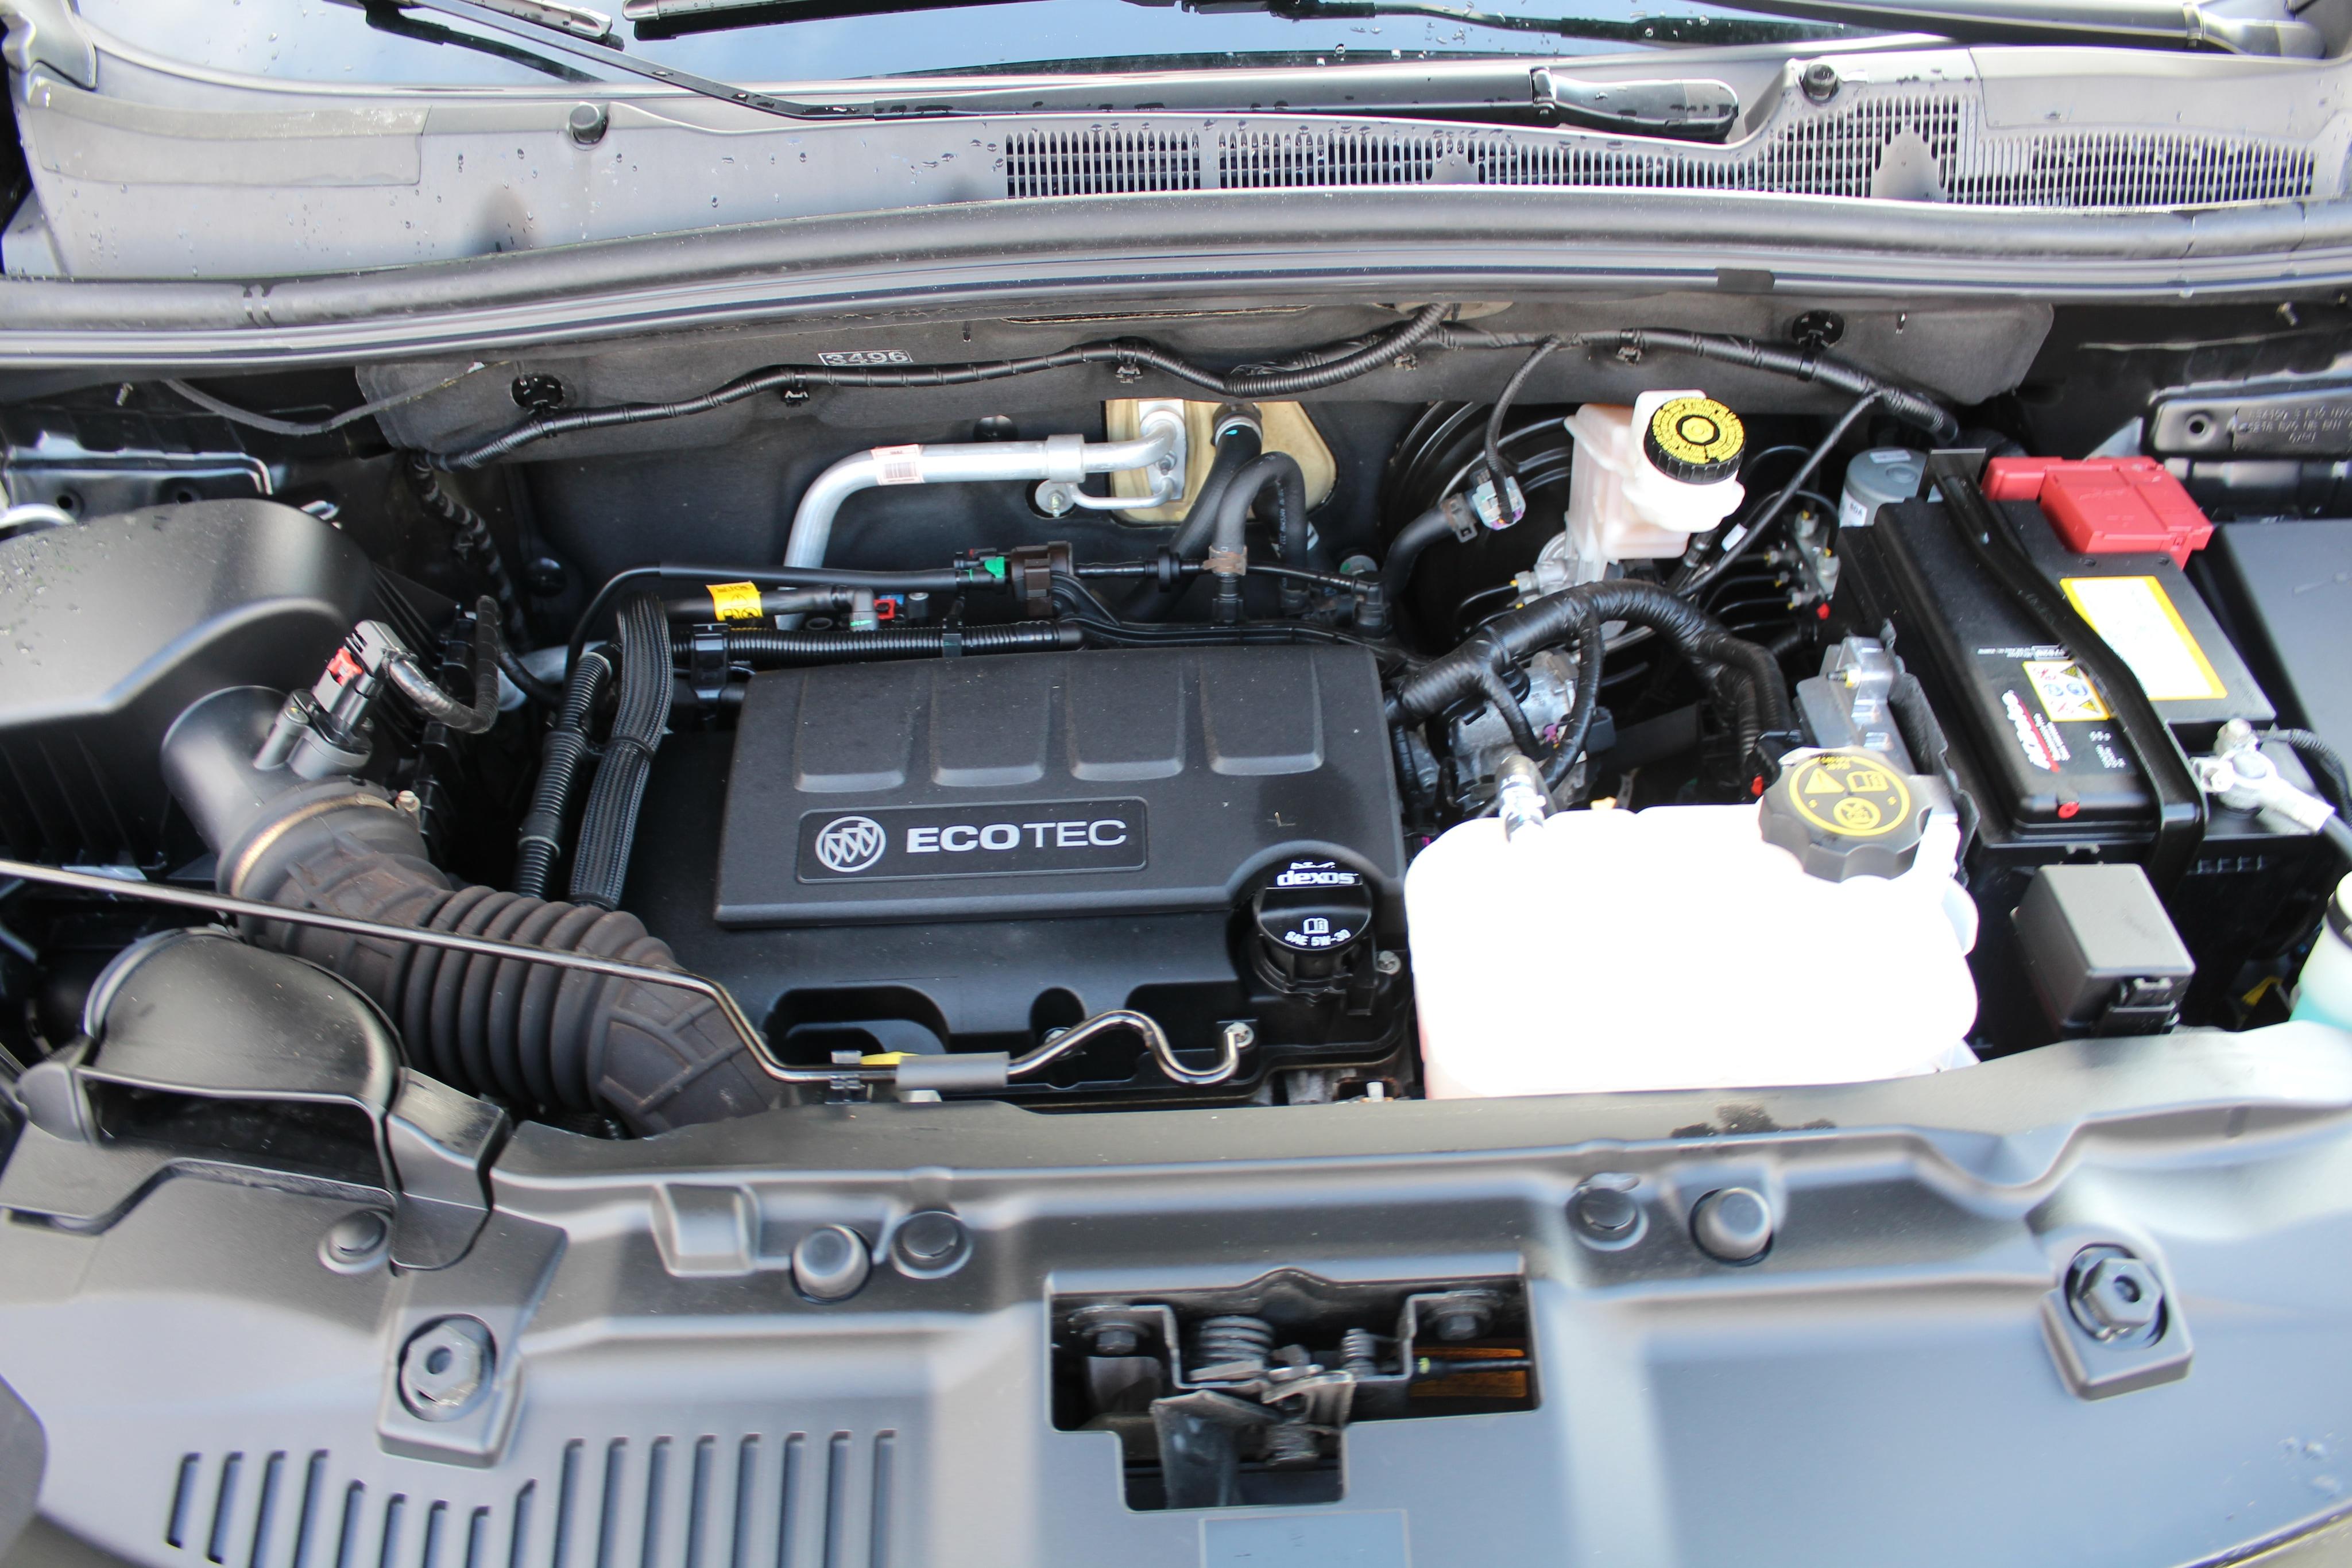 2017 Buick Encore Wagon 4 Dr.